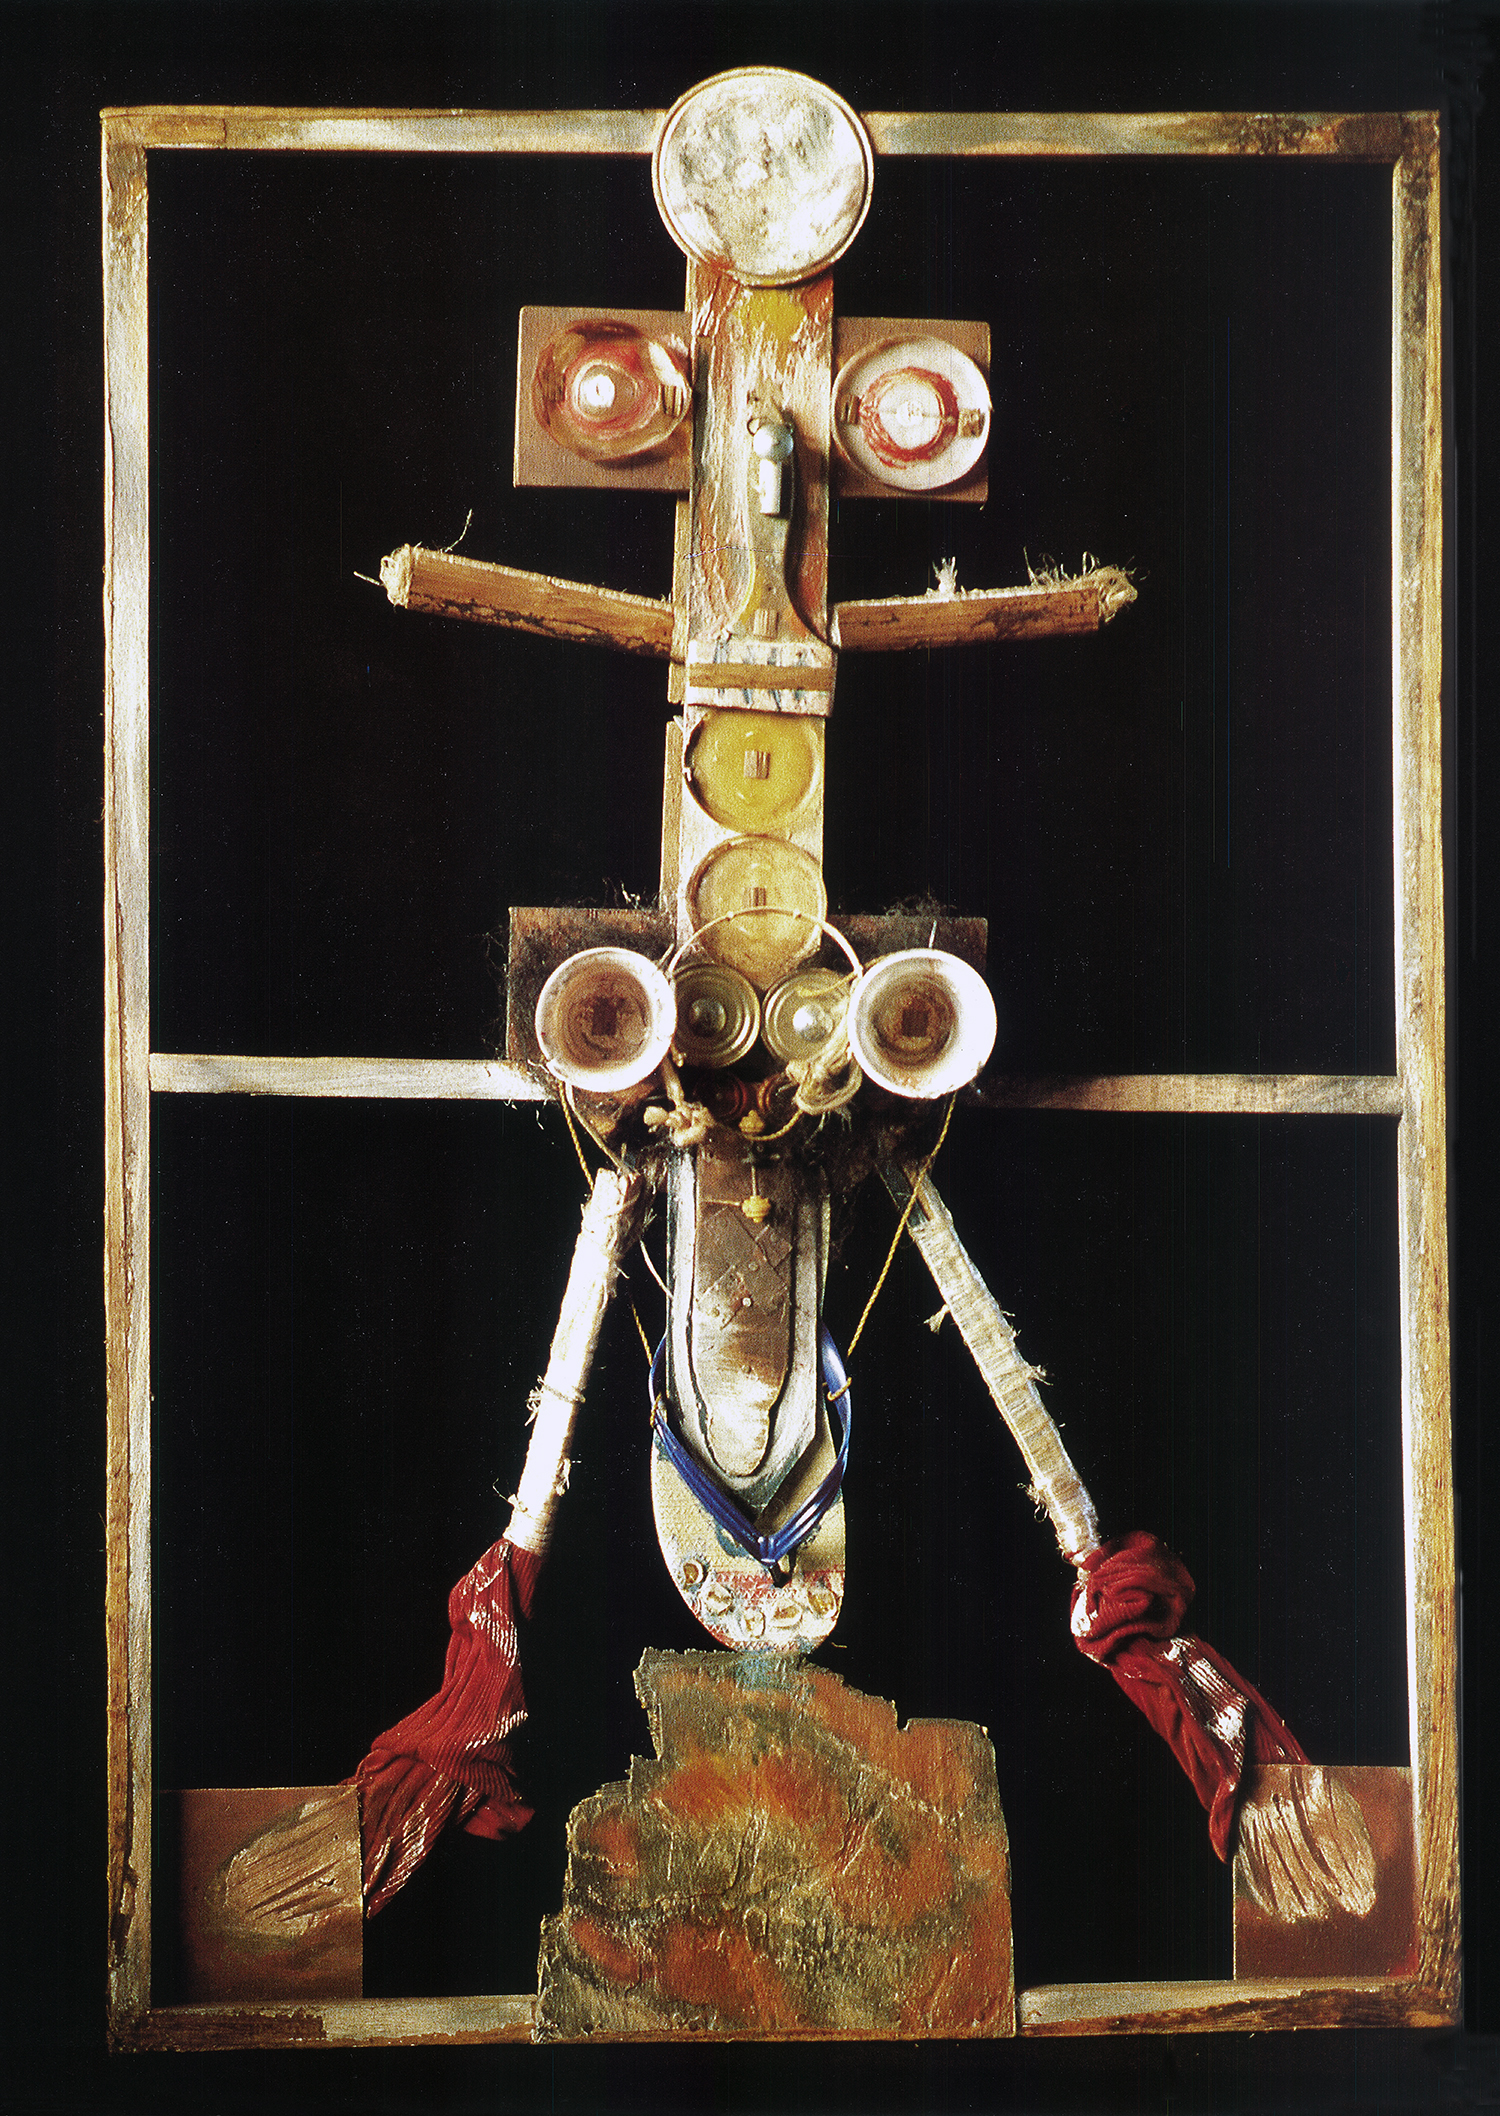 Pascale Marthine Tayou, 'Fight against Aids IV', mix media, 1994